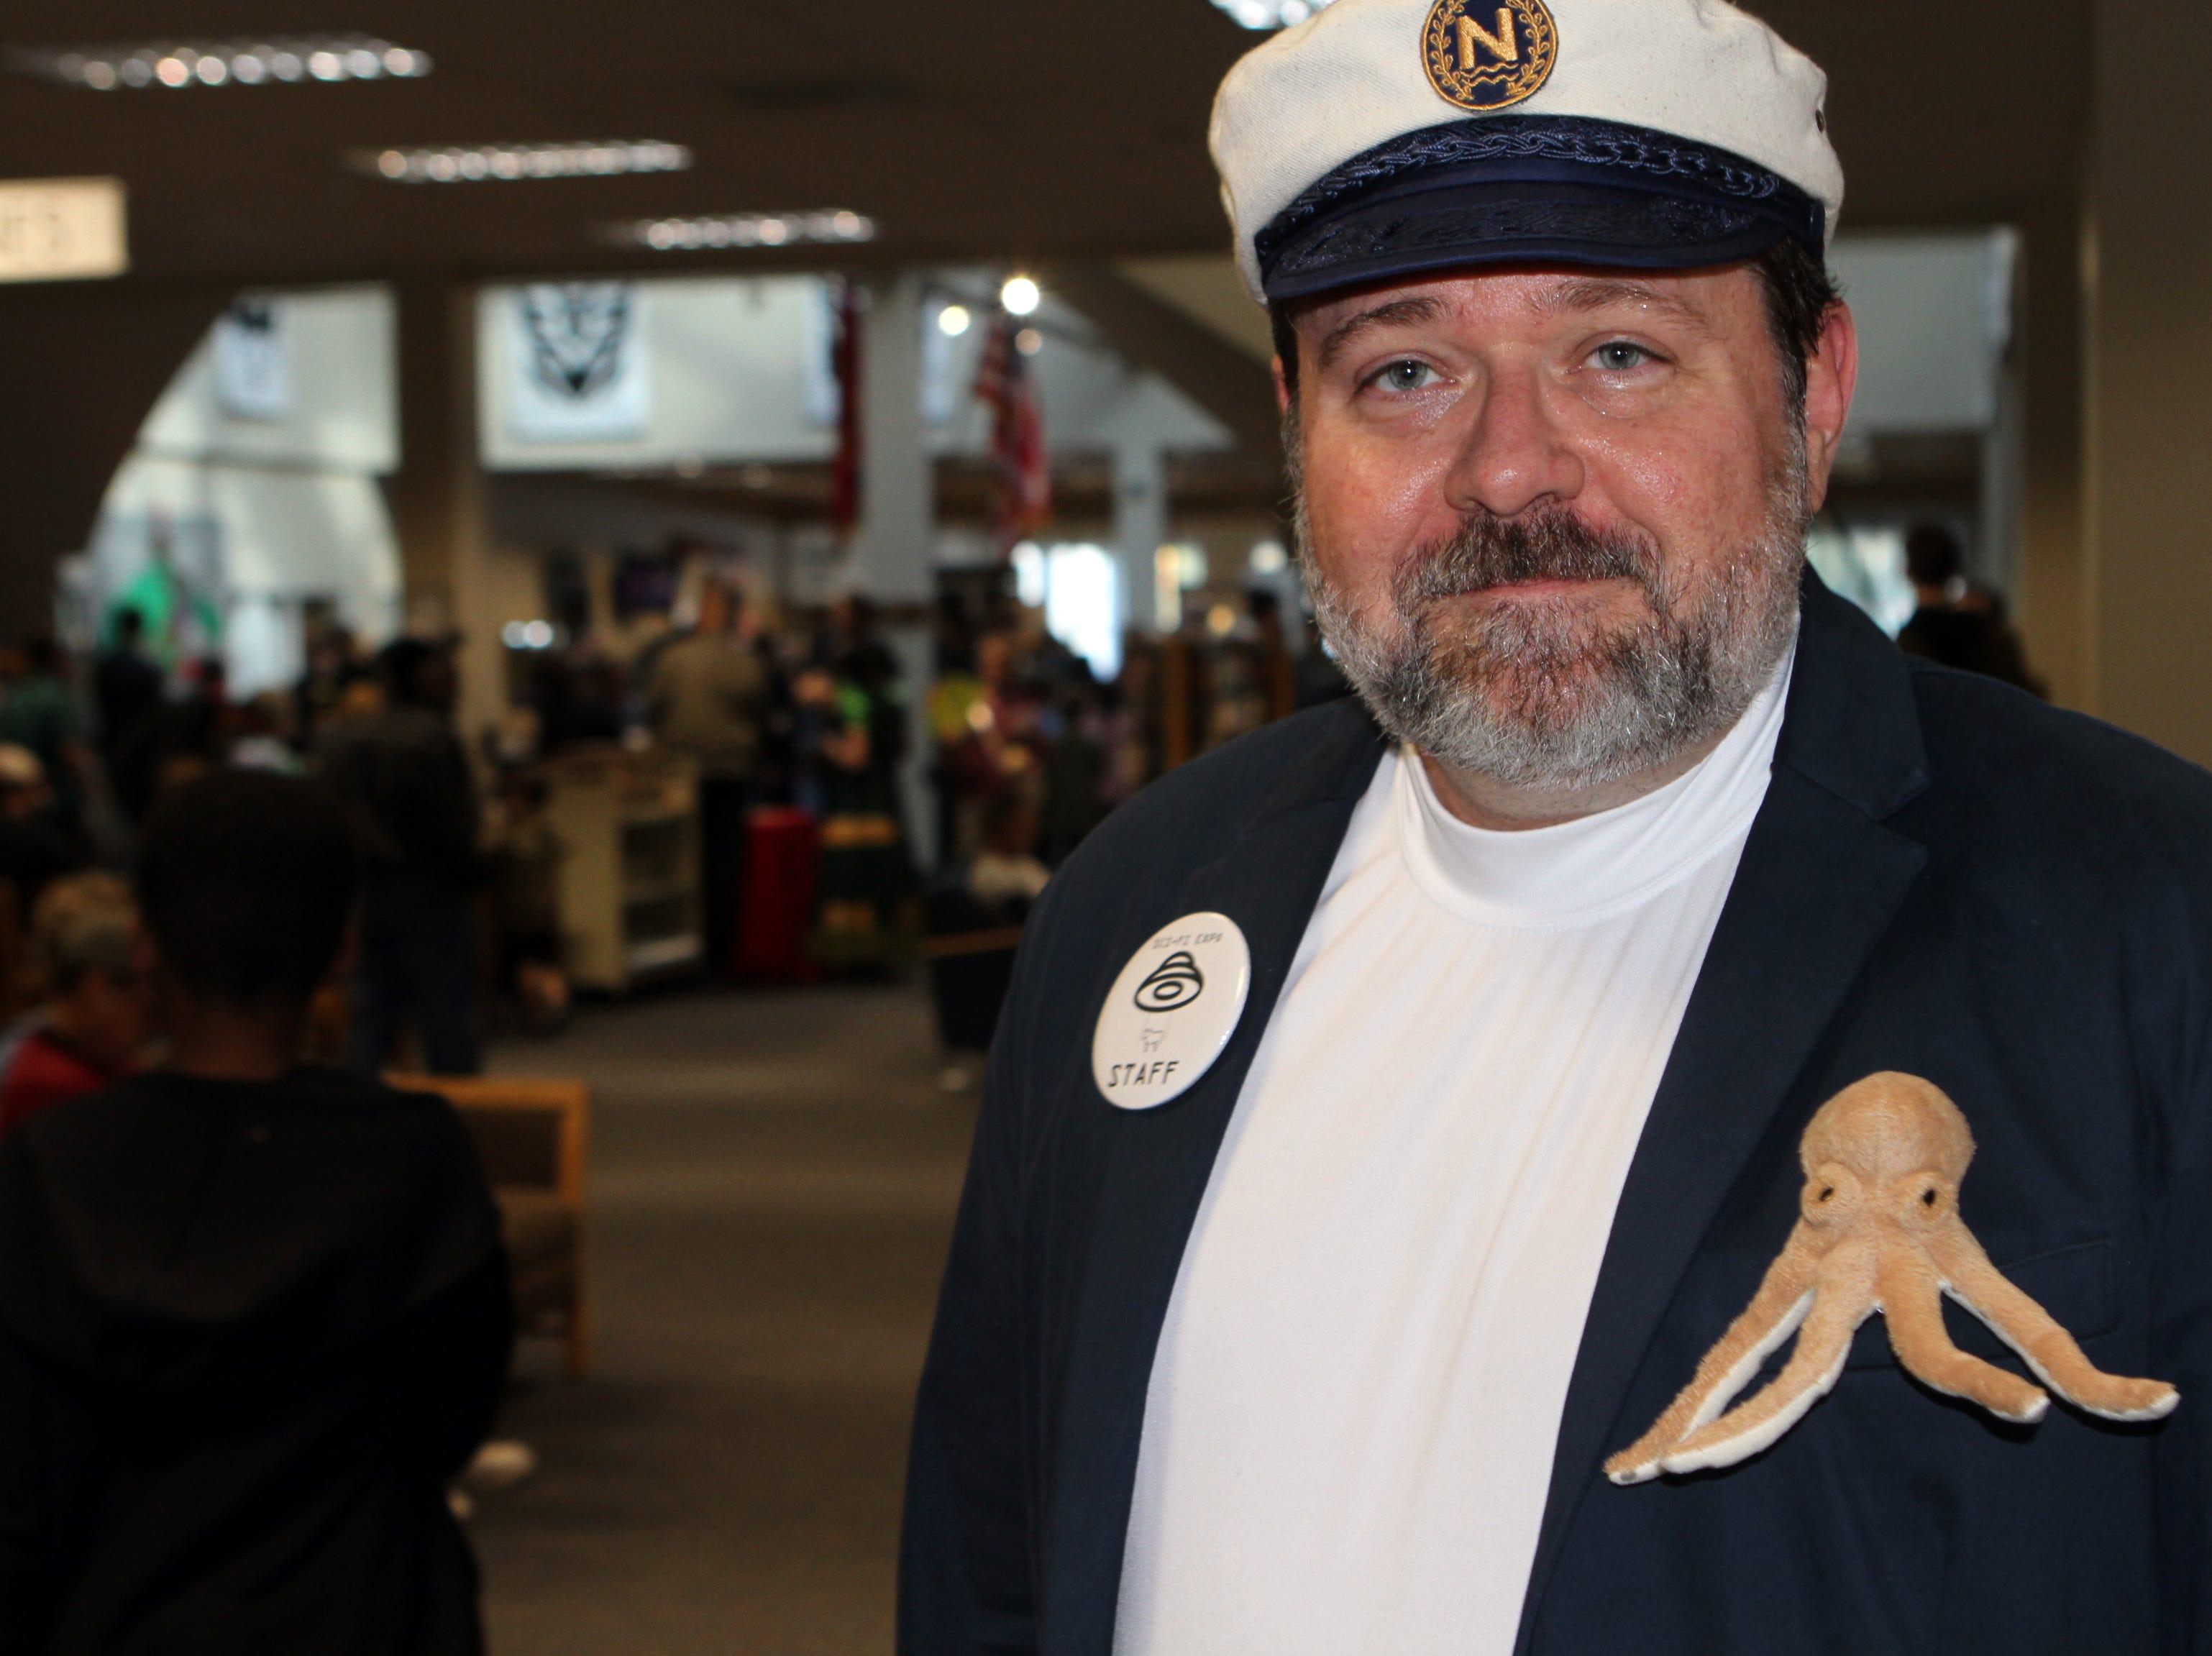 Derek Schaaf as Captain Nemo at CMC Public Library's annual Sci-Fi Expo on Saturday, November 3, 2018.